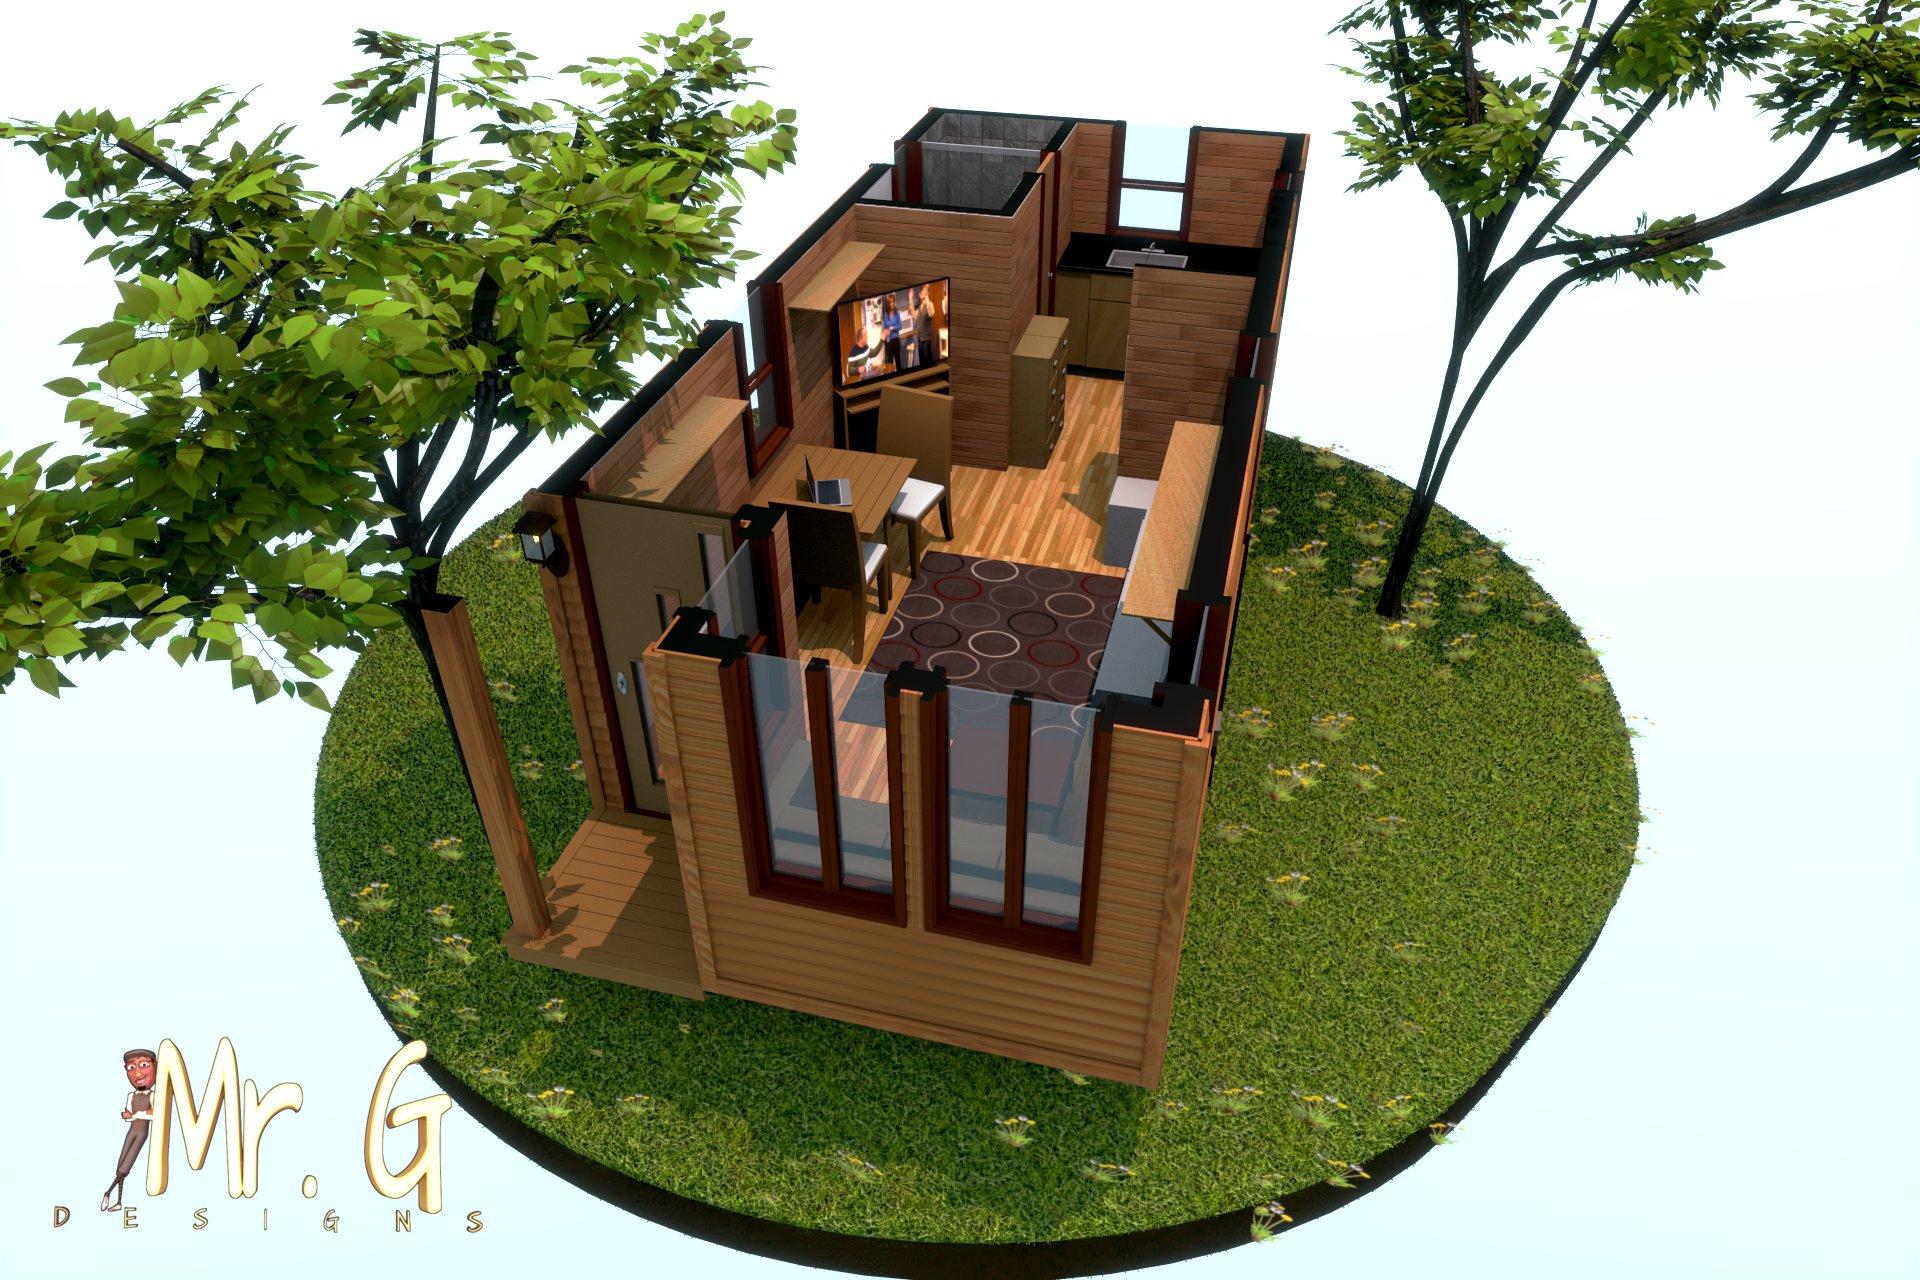 garrett s tiny house 3d floor plan model. Black Bedroom Furniture Sets. Home Design Ideas